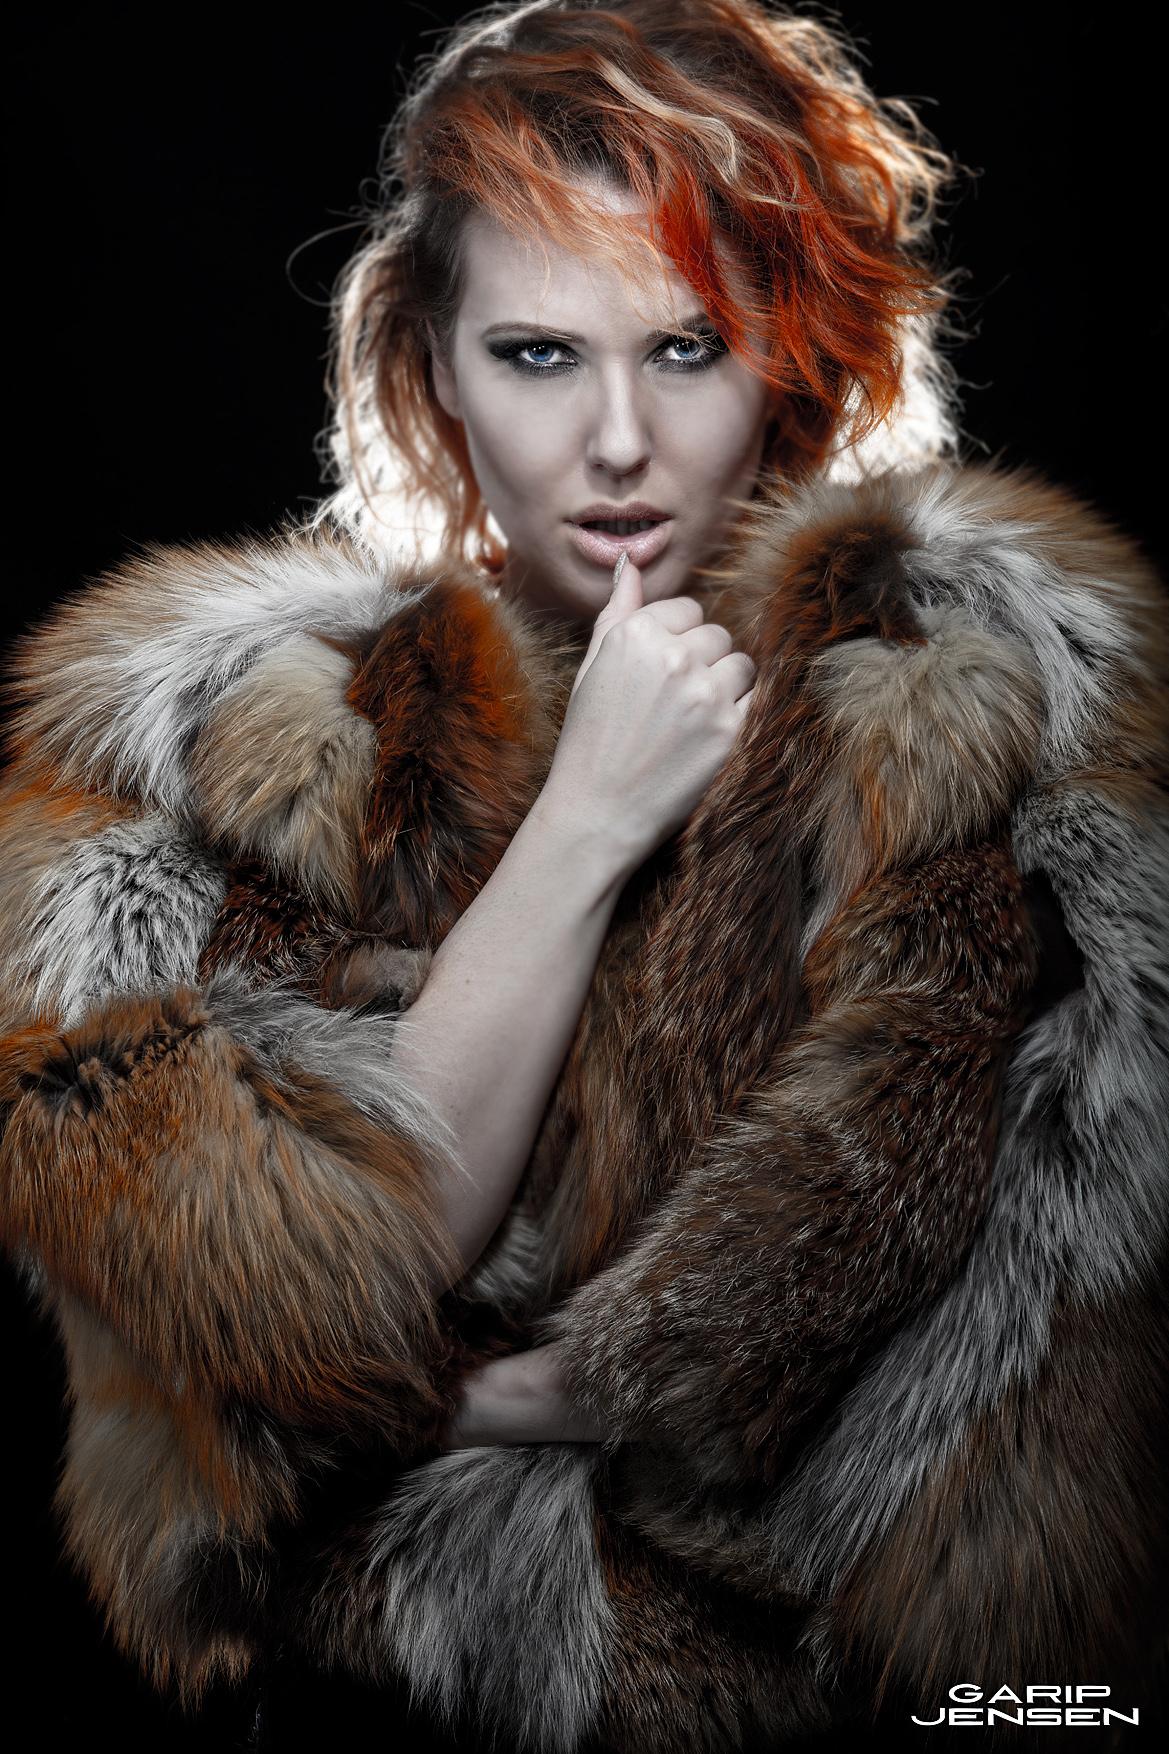 Swedish model in a foxy fur coat.